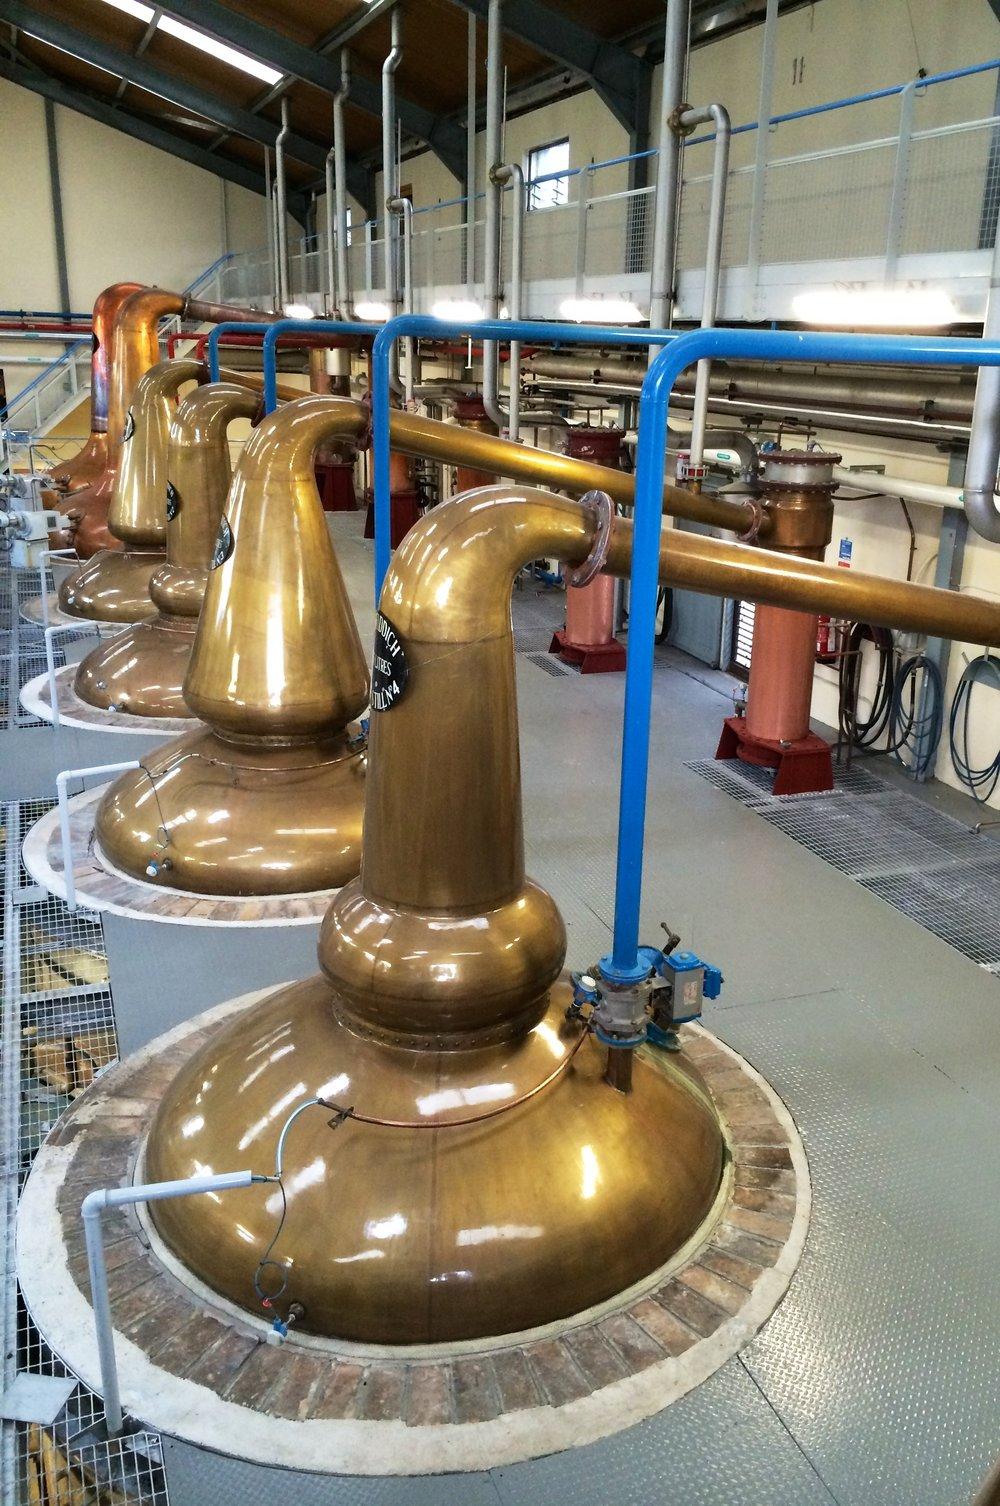 Glenfiddich Distillery, Scotland